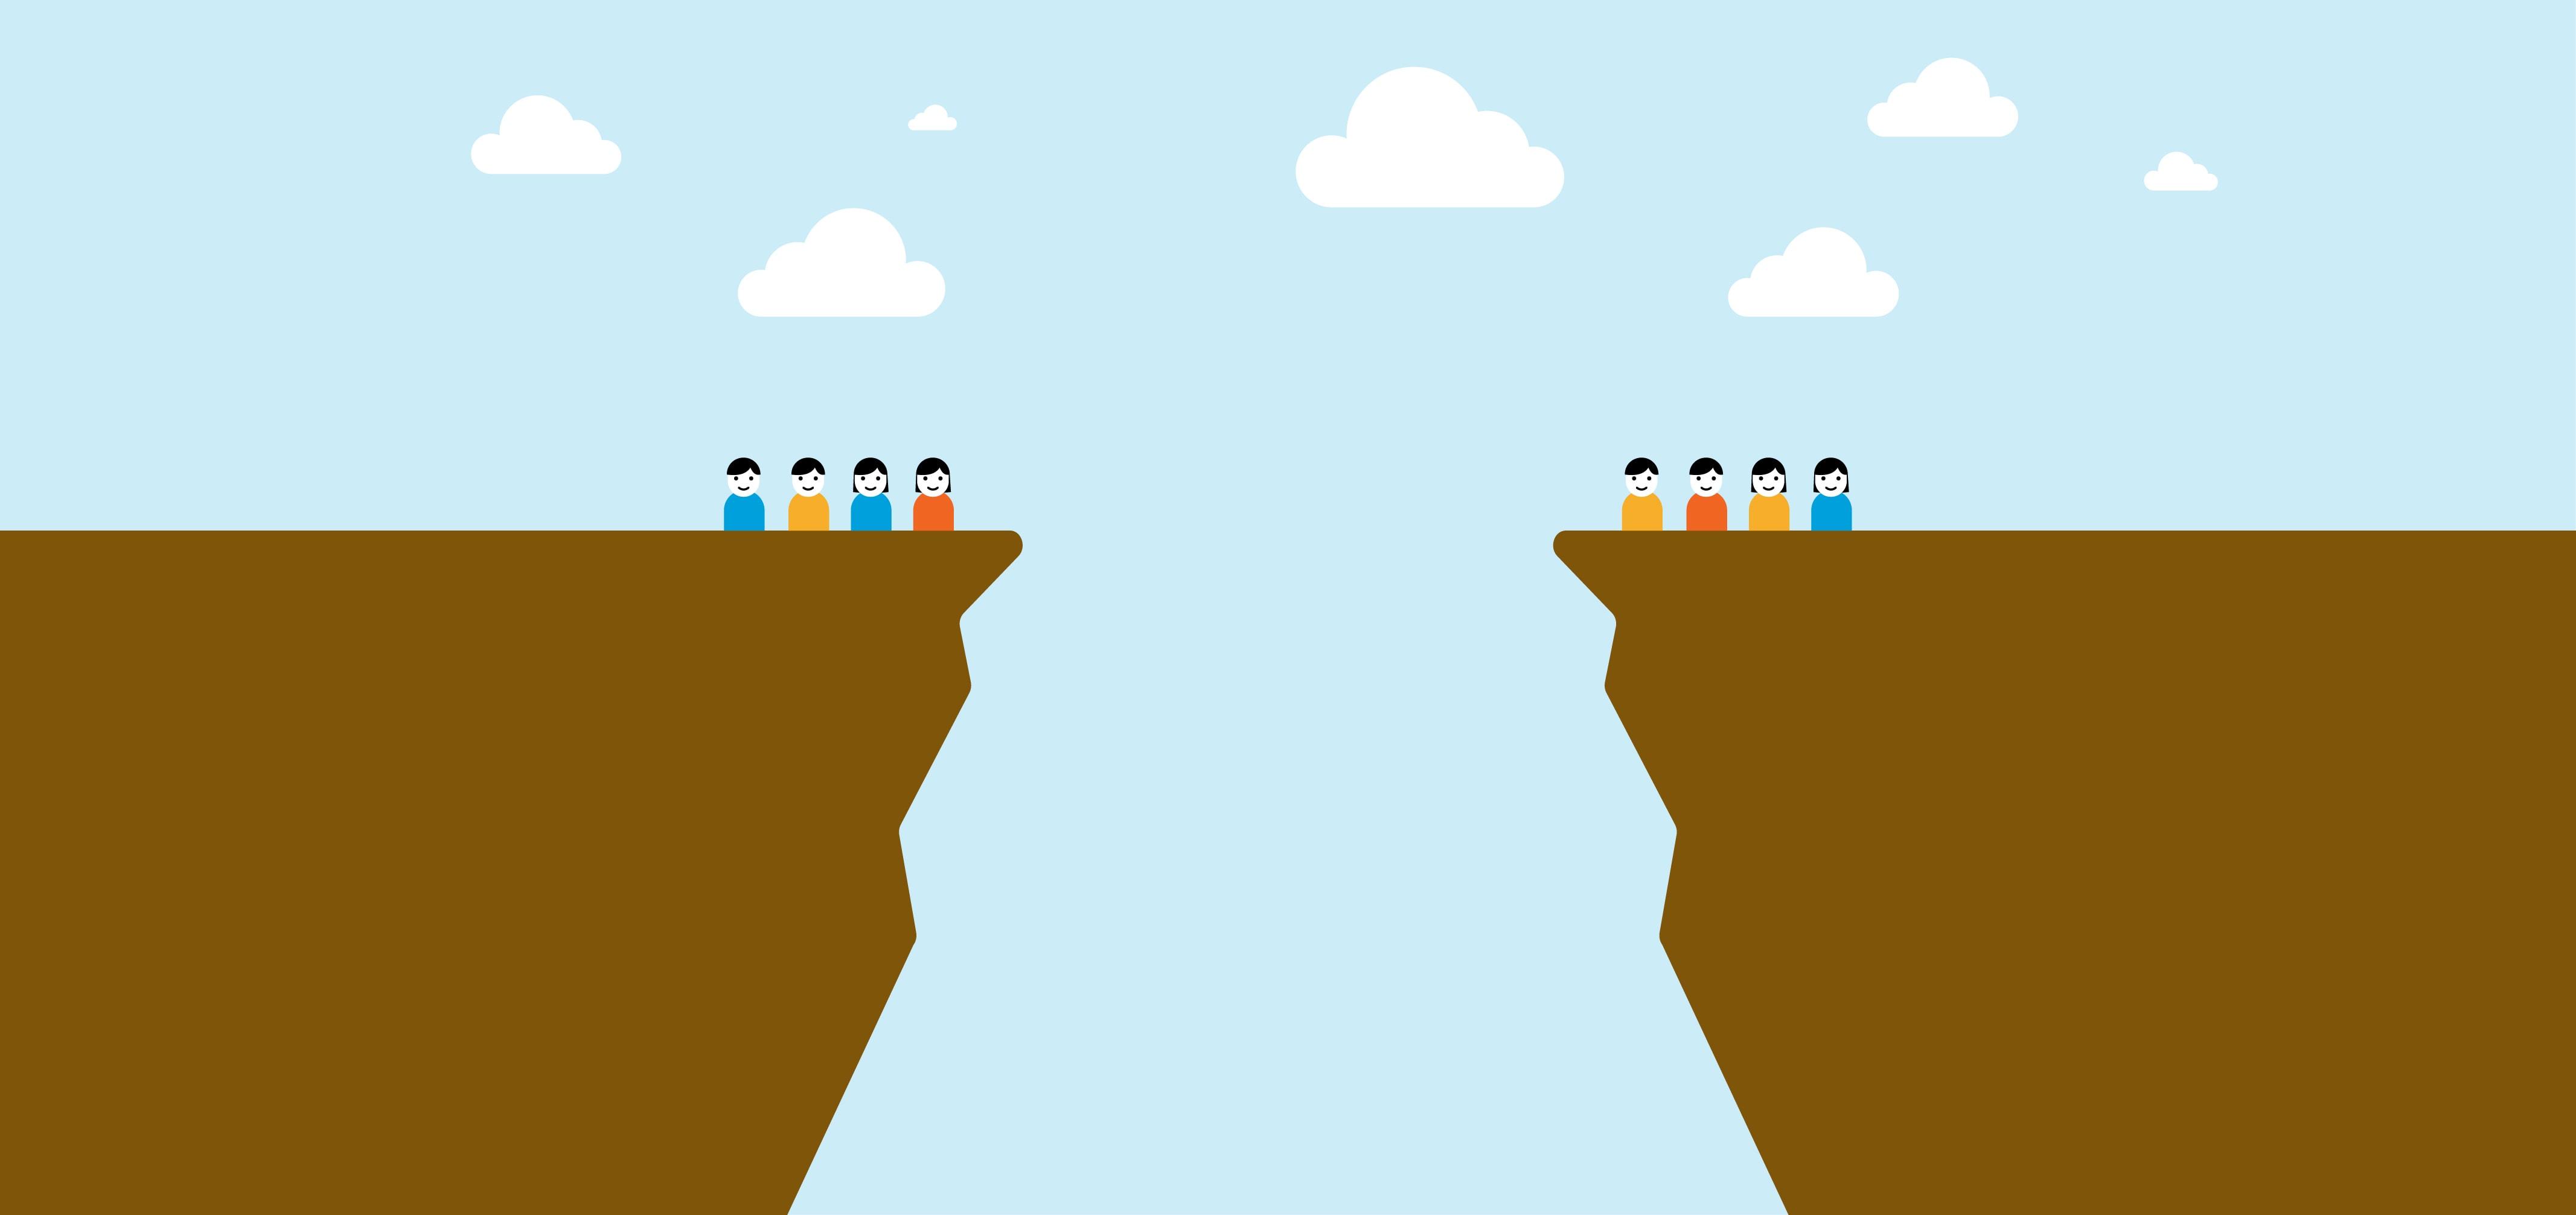 Higher Education Blogging Chasm